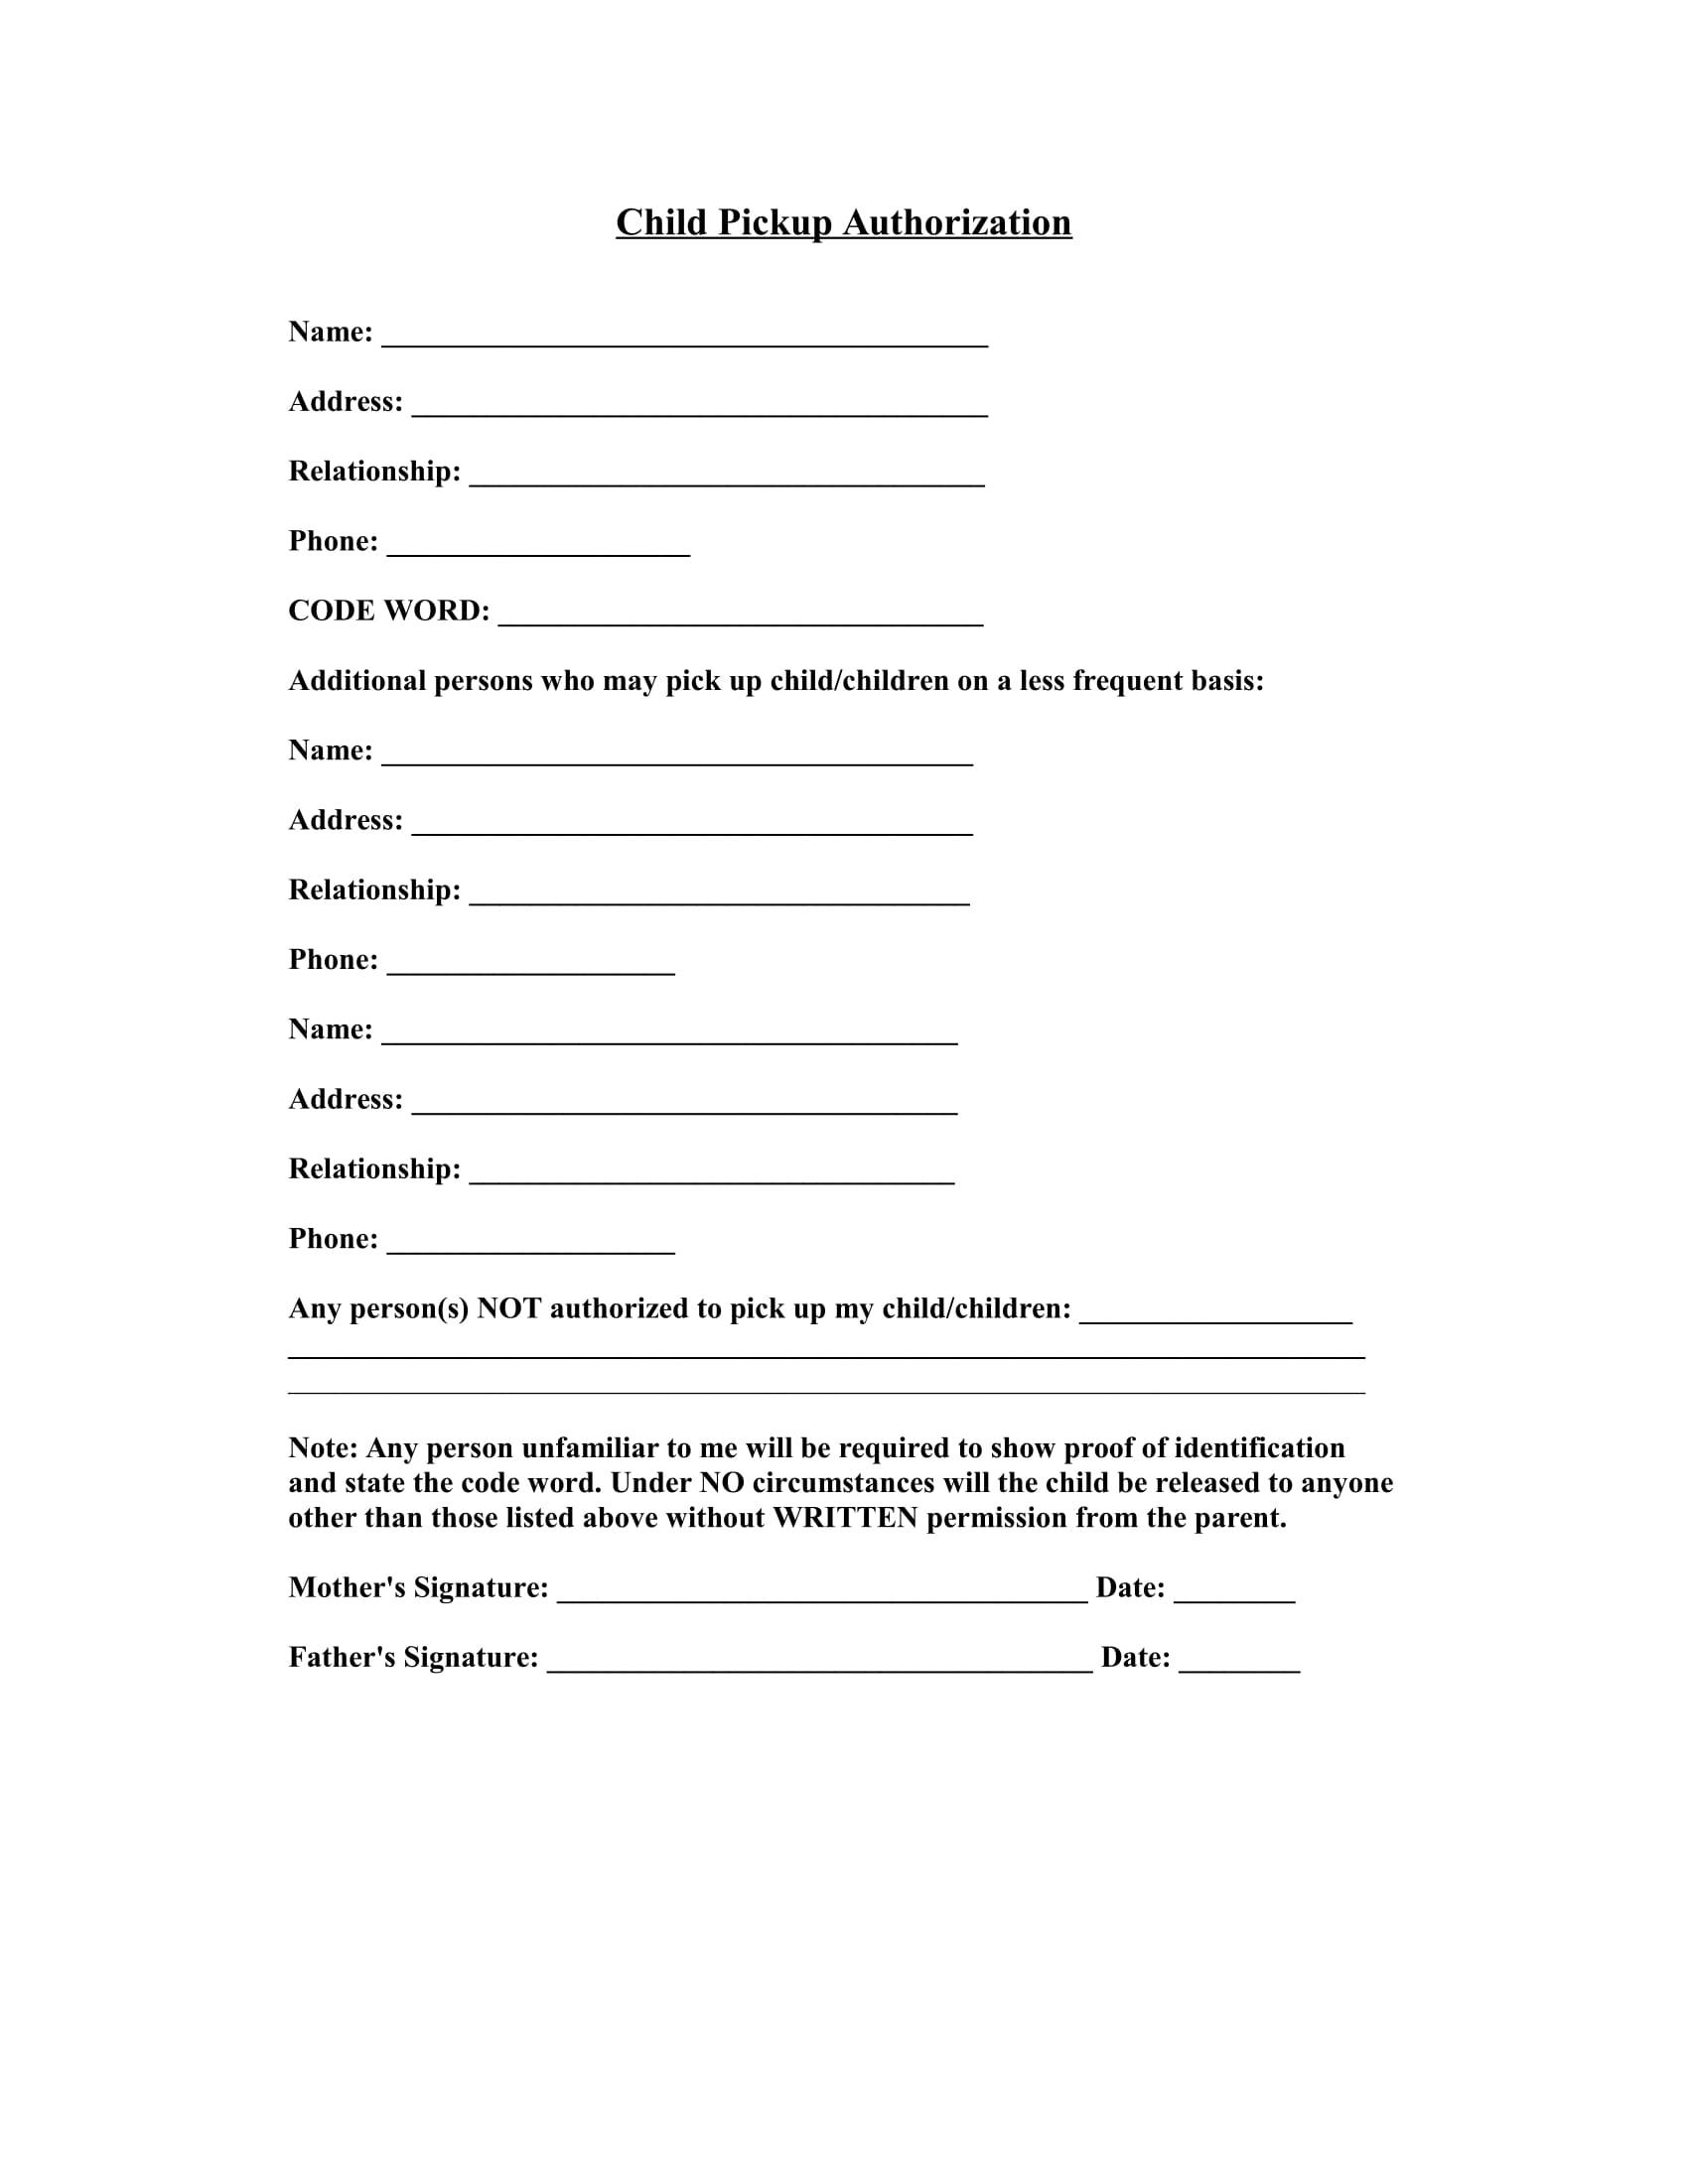 daycare child pickup authorization information 1